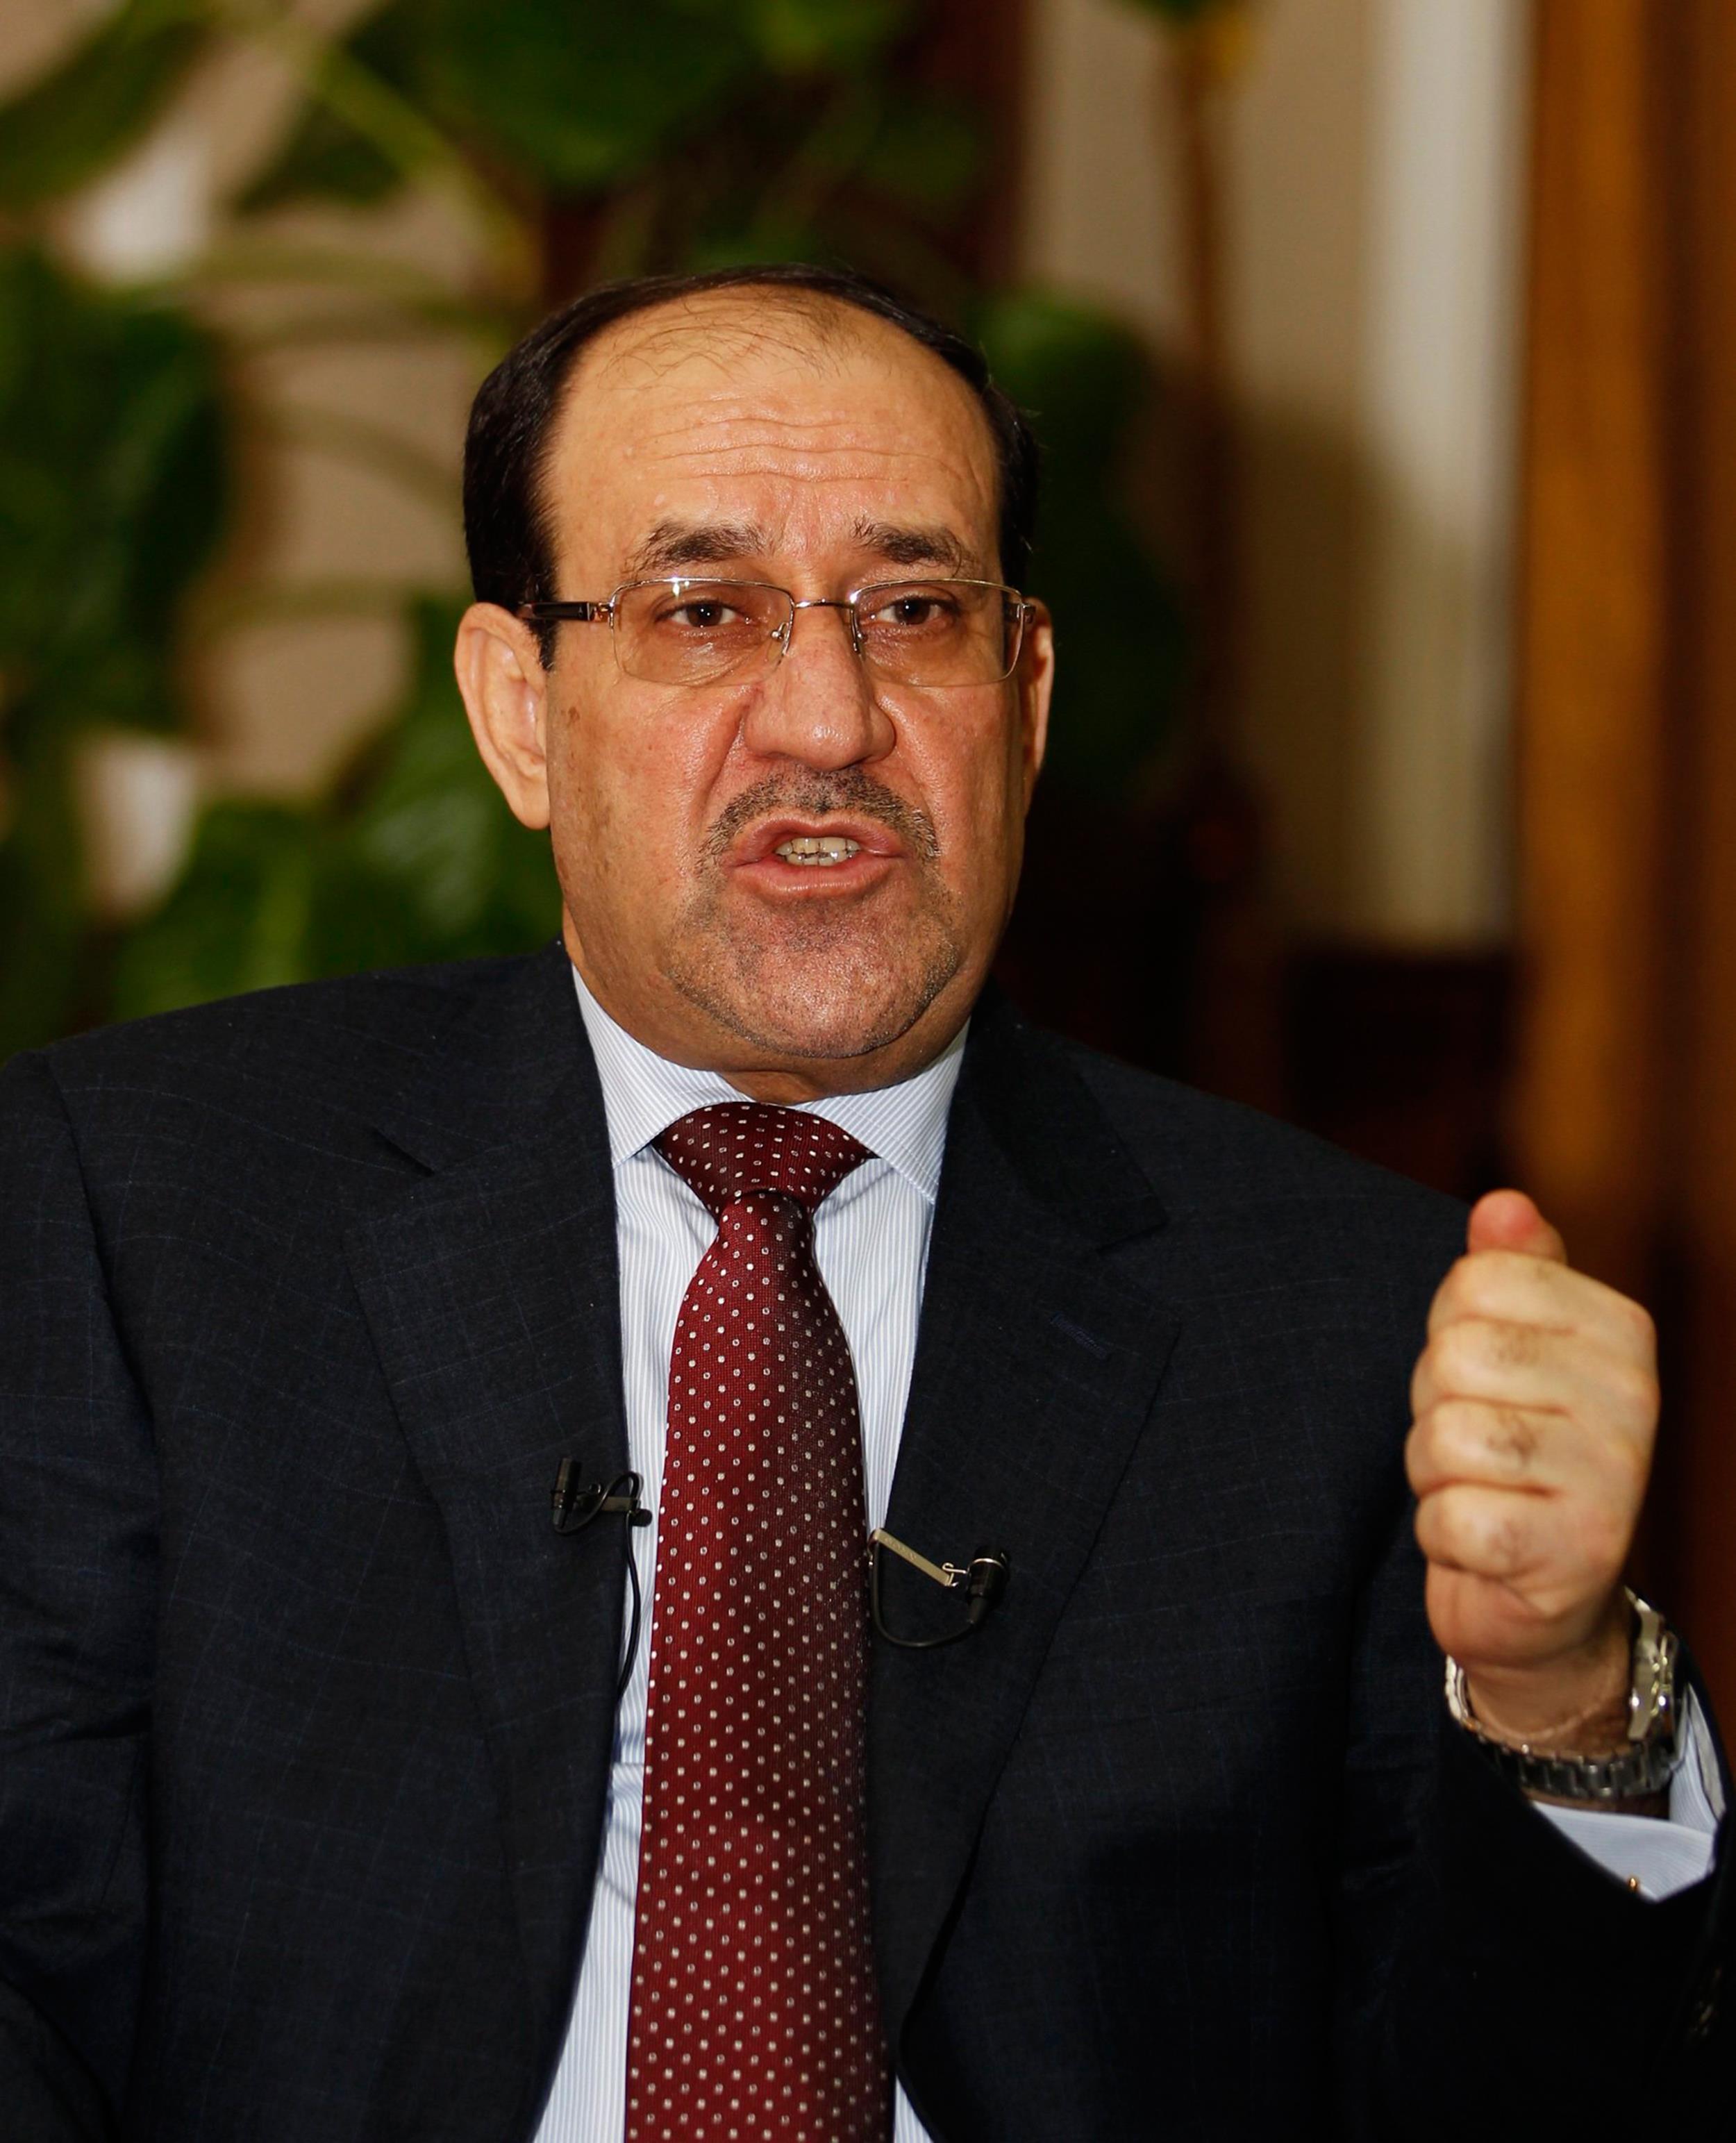 Image: Iraq's Prime Minister al-Maliki